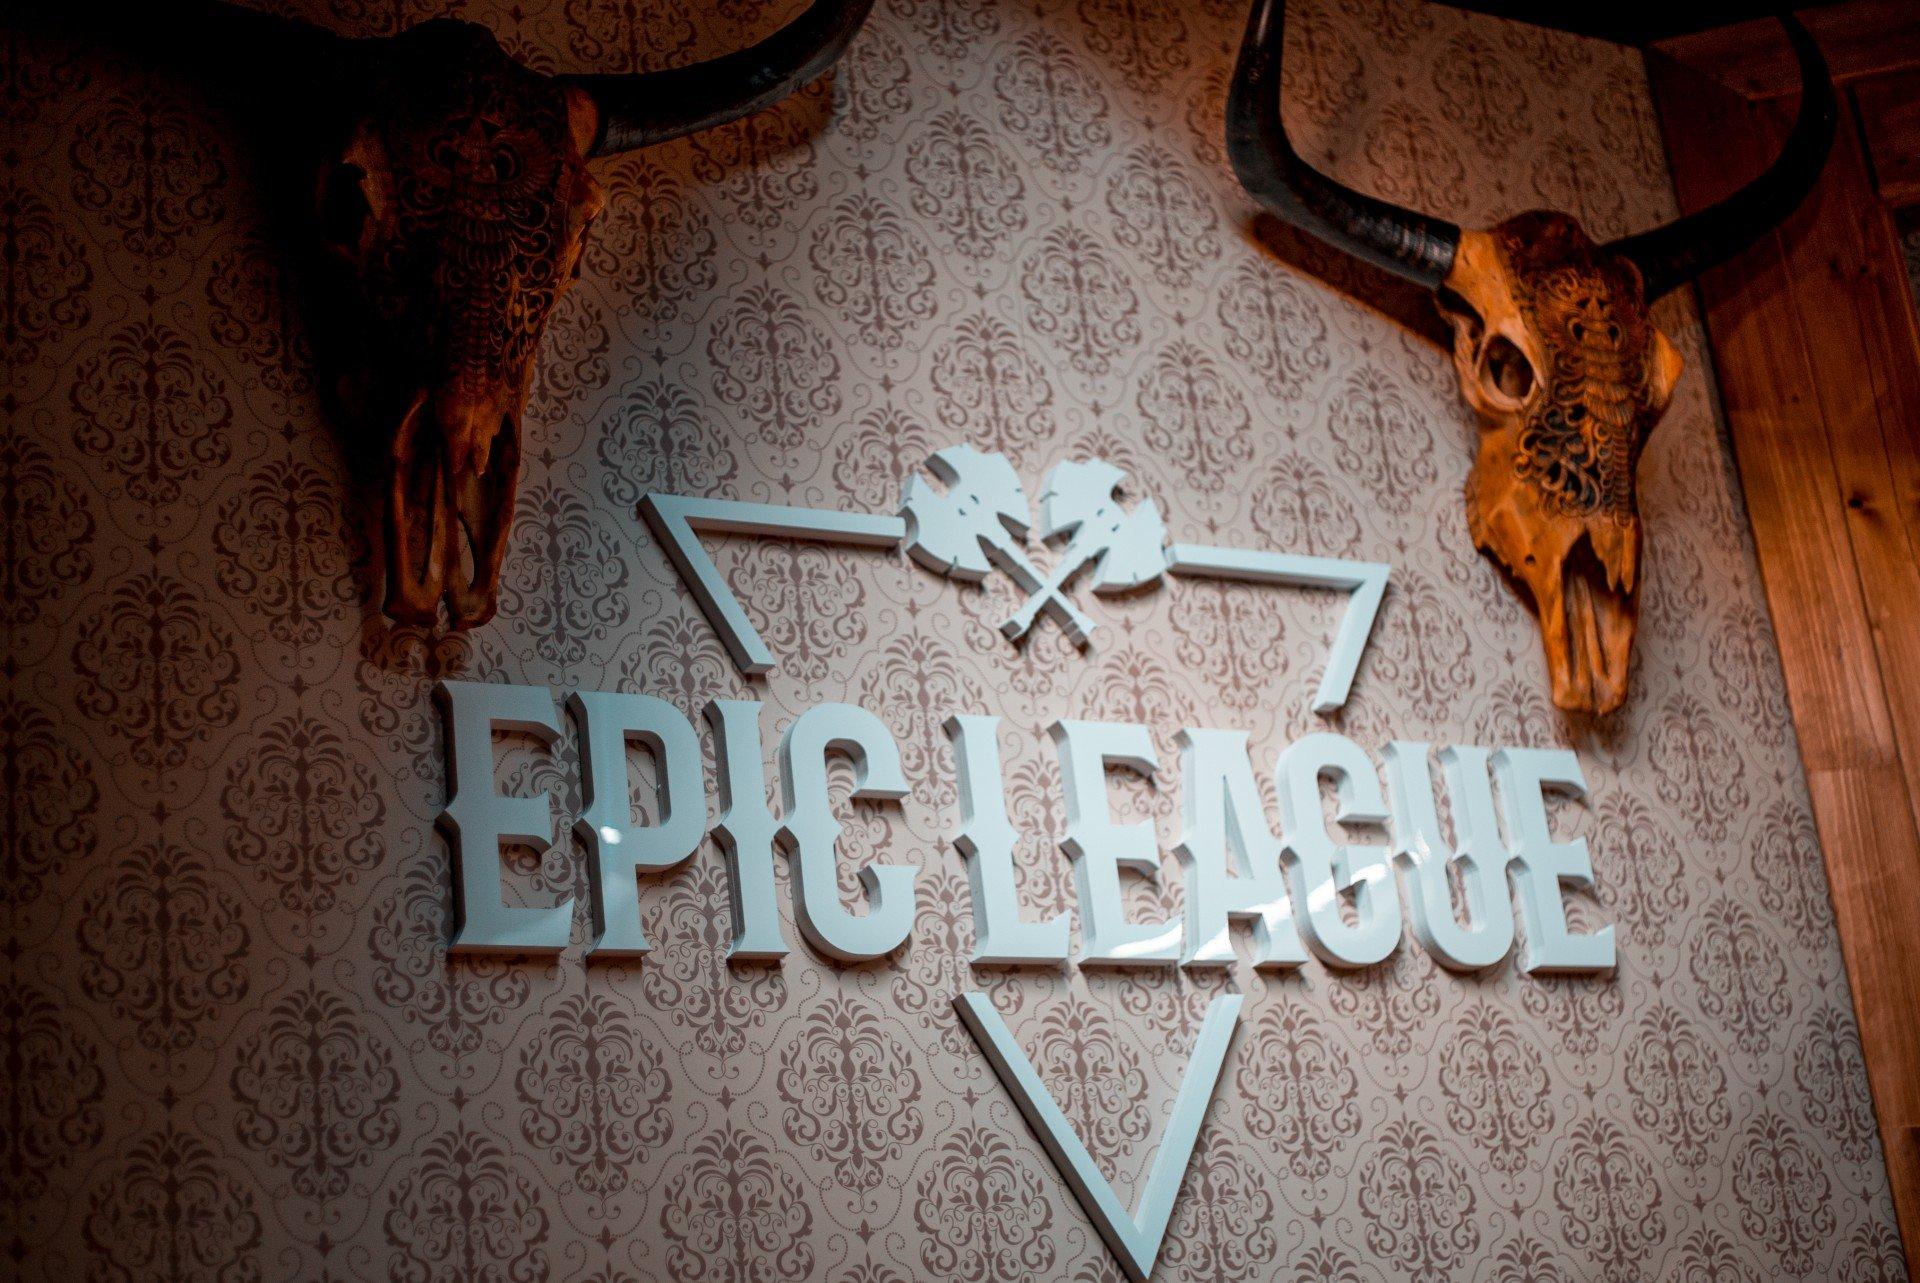 Подробности освещения EPIC League в стиле Дикого Запада с Maelstorm и Marchello